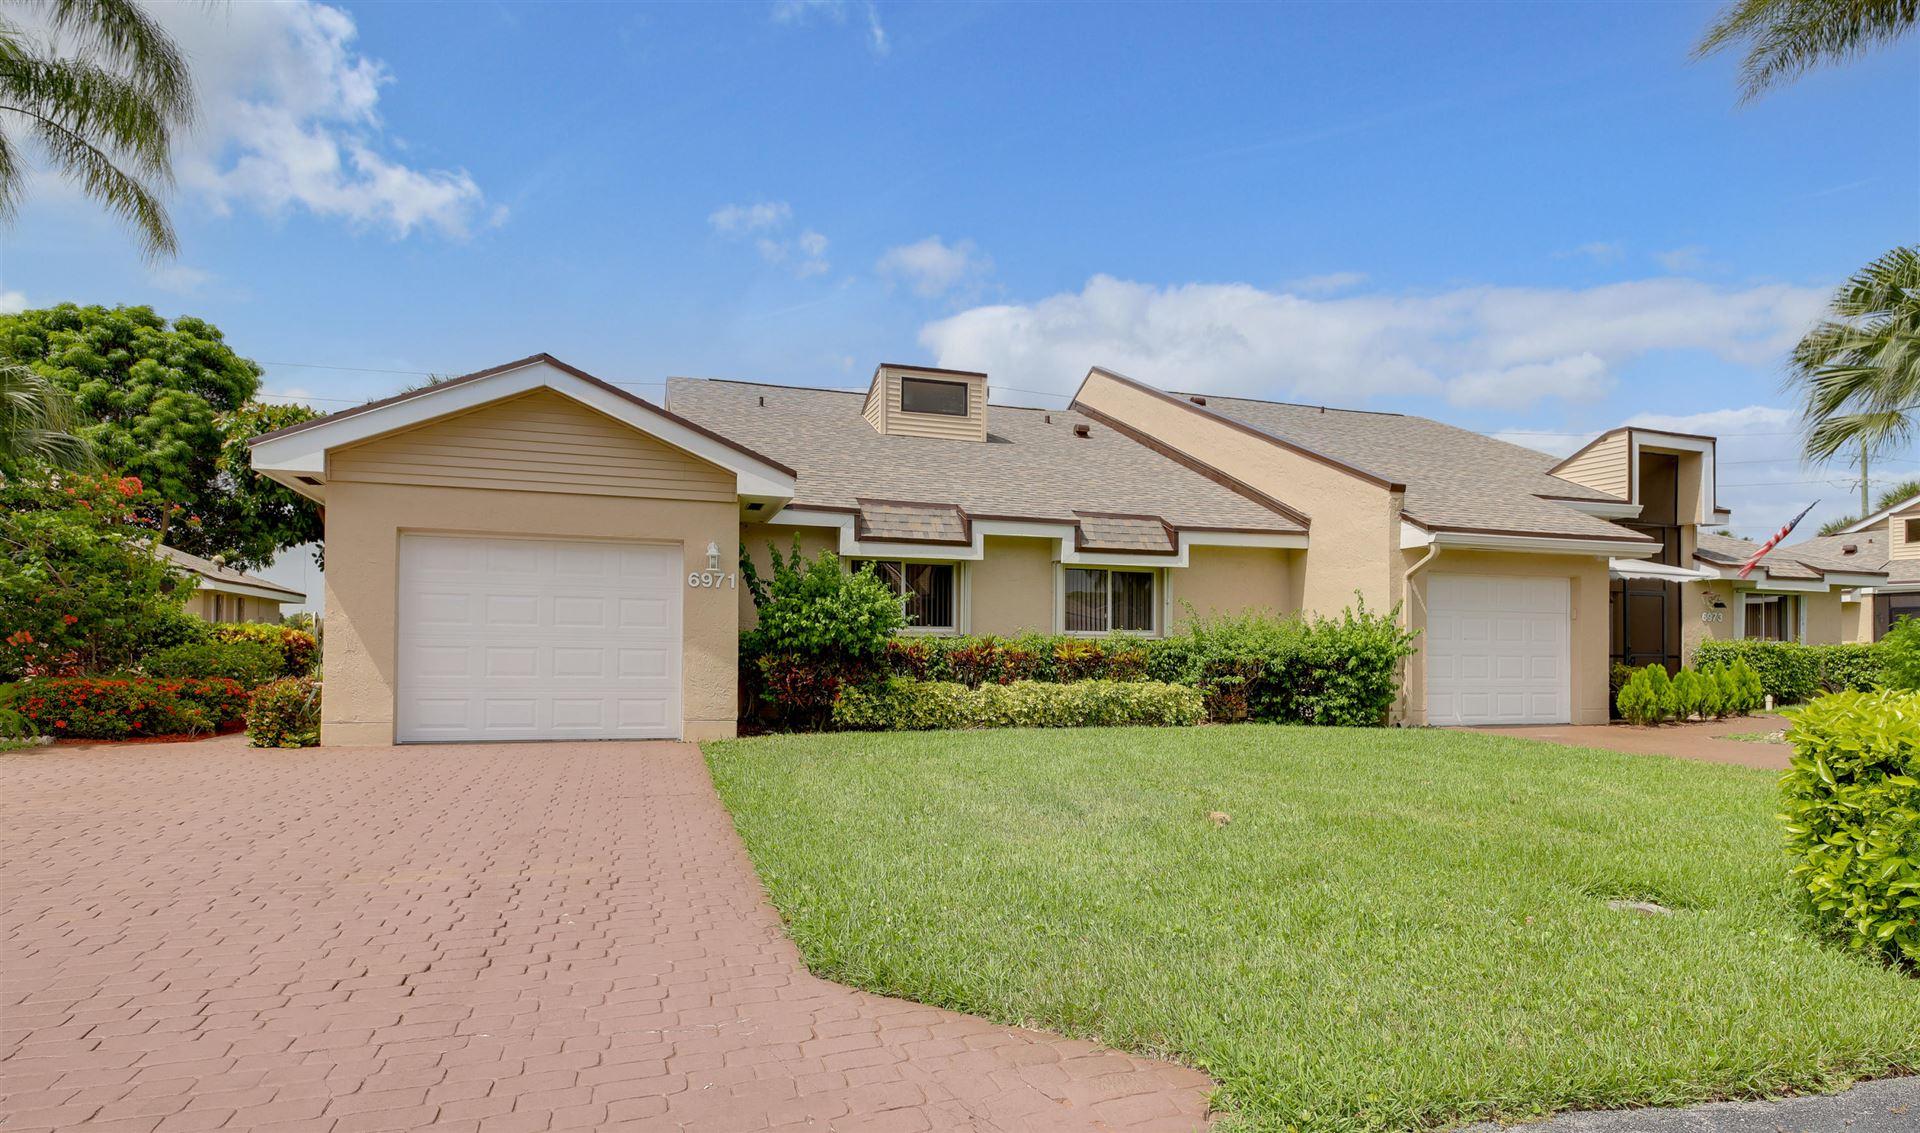 6971 Fountains Circle, Lake Worth, FL 33467 - MLS#: RX-10740368